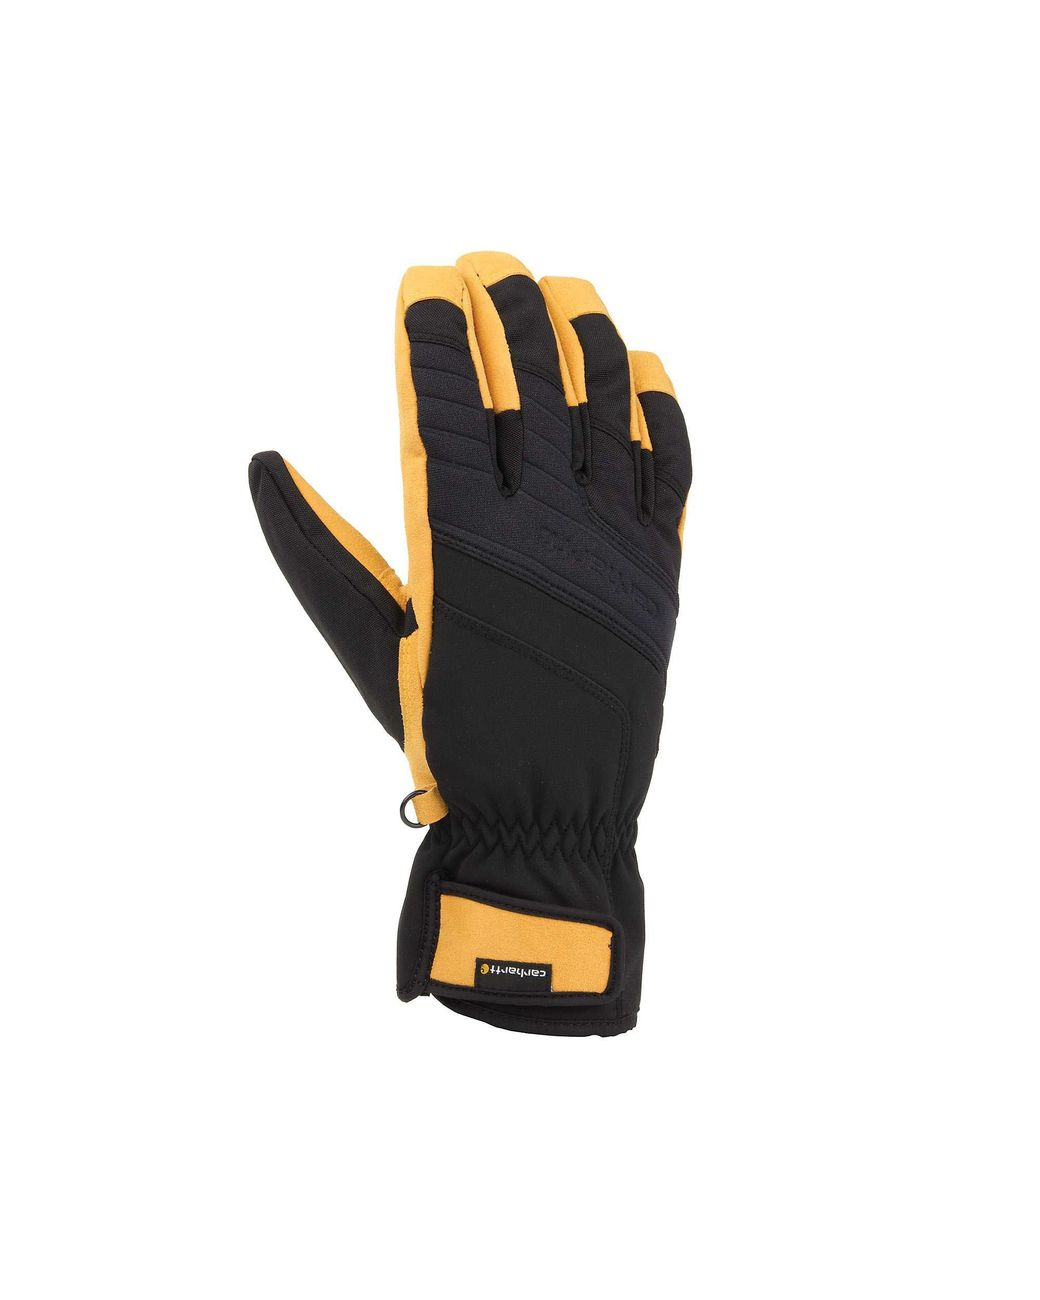 Carhartt mens Stoker Glove Cold Weather Gloves